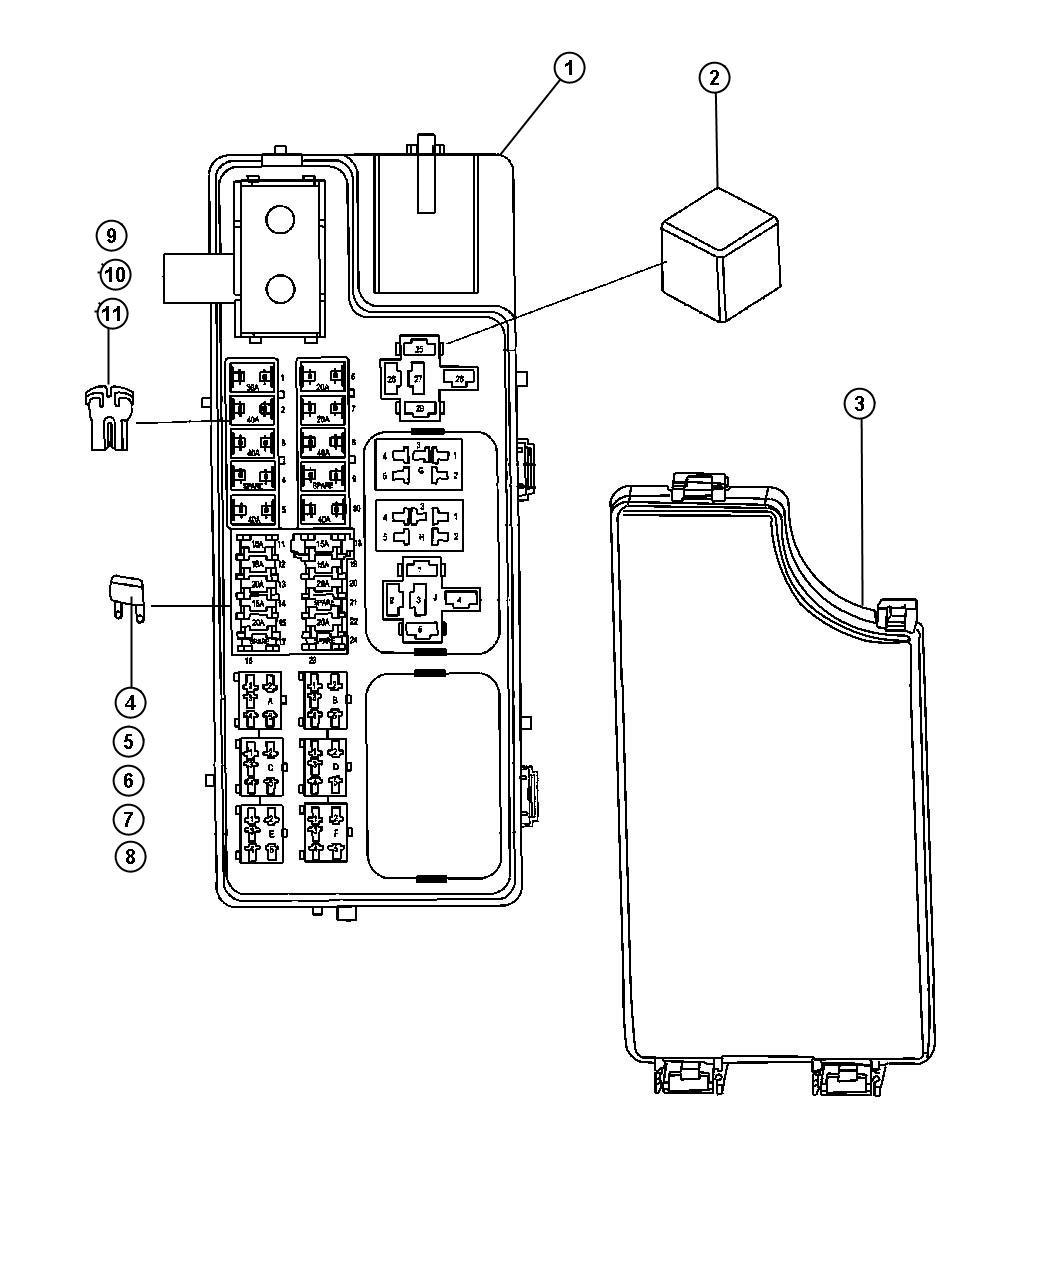 2010 Jeep Comp Fuse Box Wiring Diagram Forward